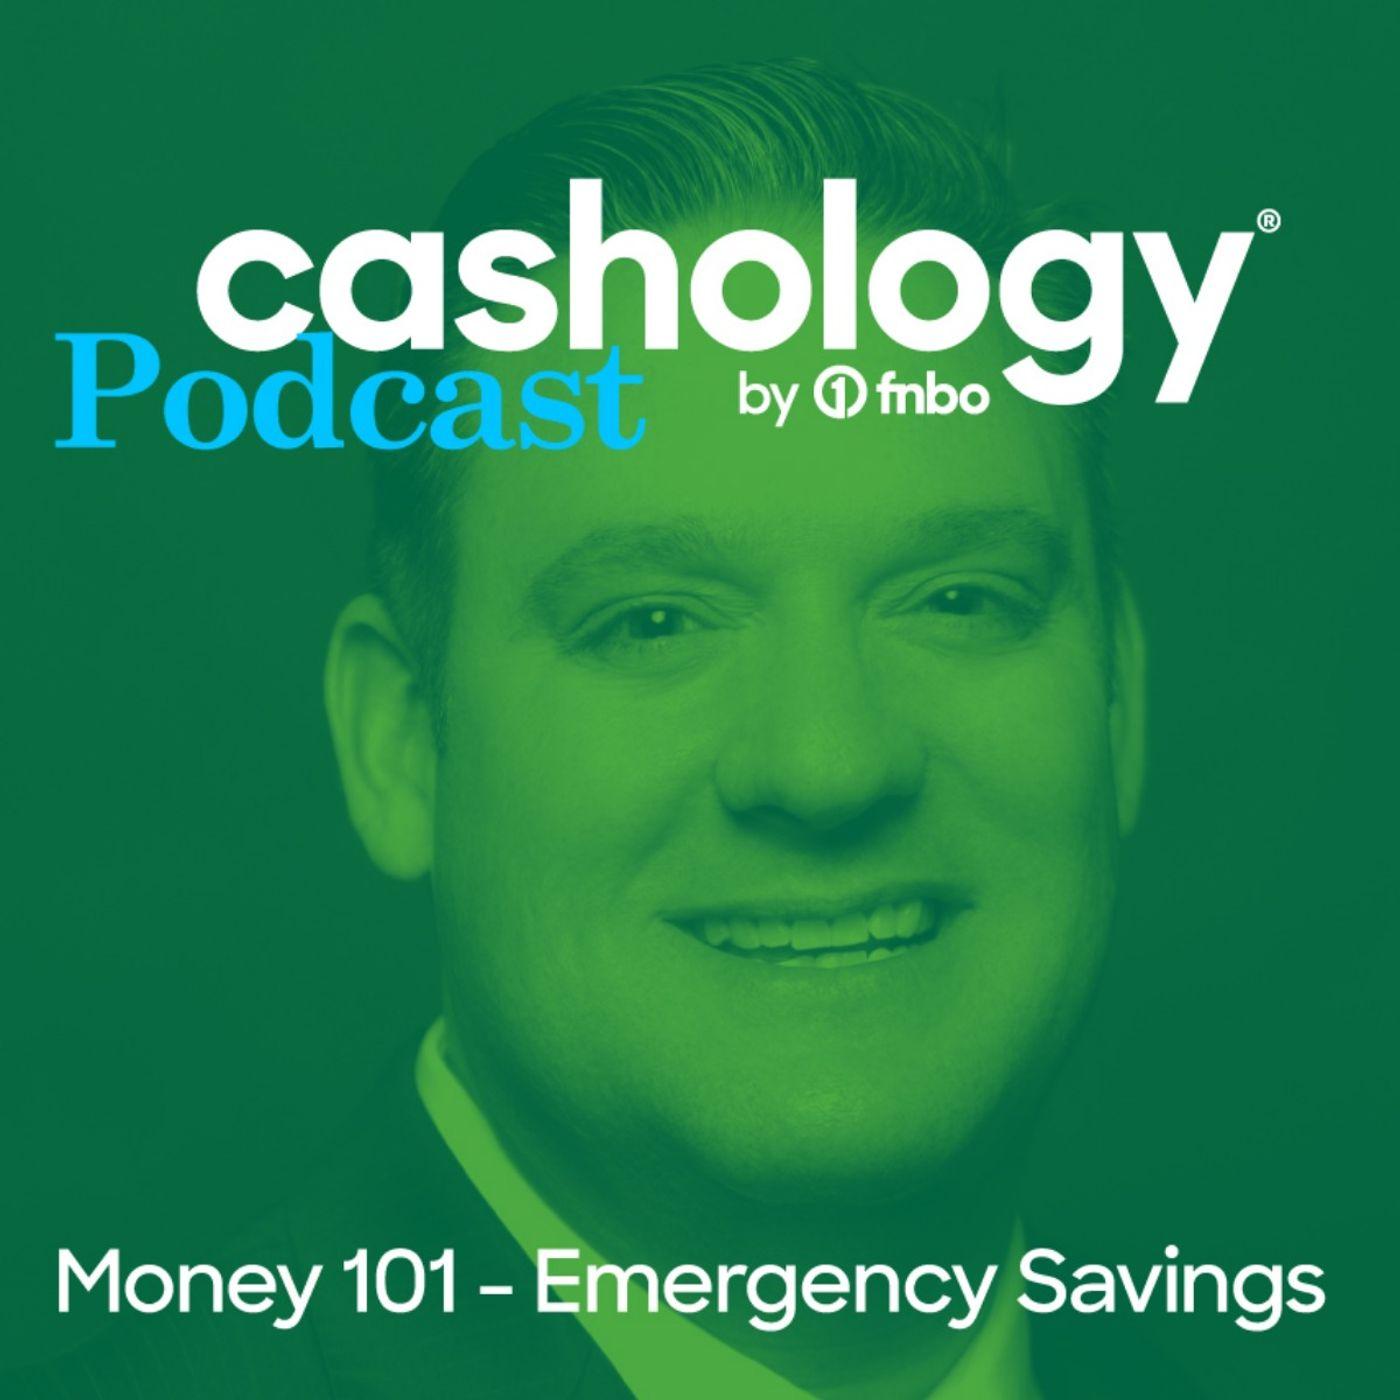 Money 101 - Emergency Savings